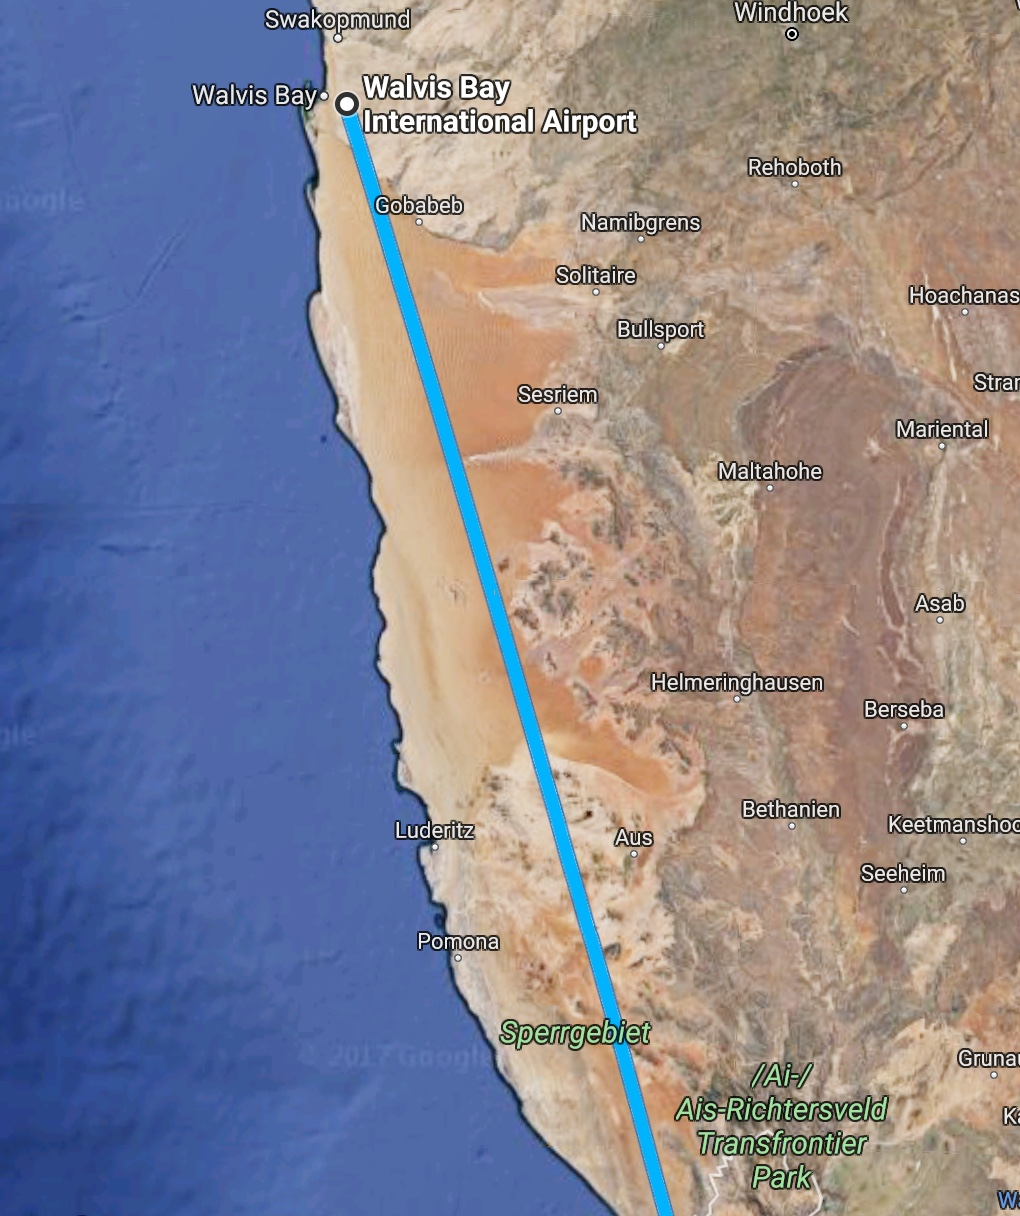 Rota do vôo Walvis Bay - Cidade do Cabo - Air Namibia